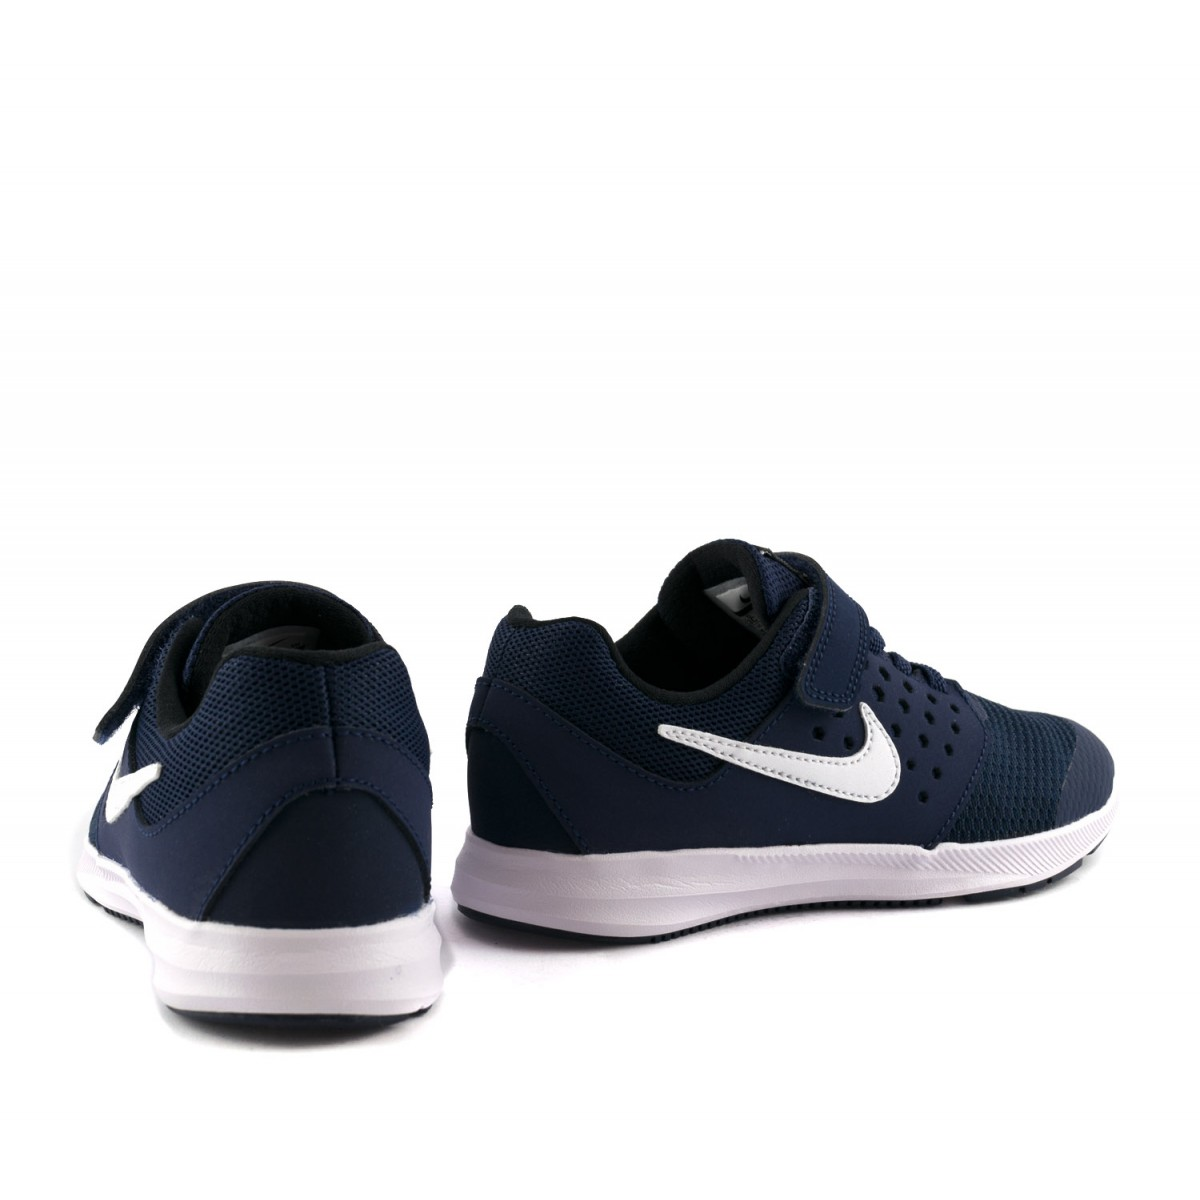 857abb38a07 ... Nike Niño Zapatilla Downshifter 7 (PSV) 869970 400 Azul Marino ...